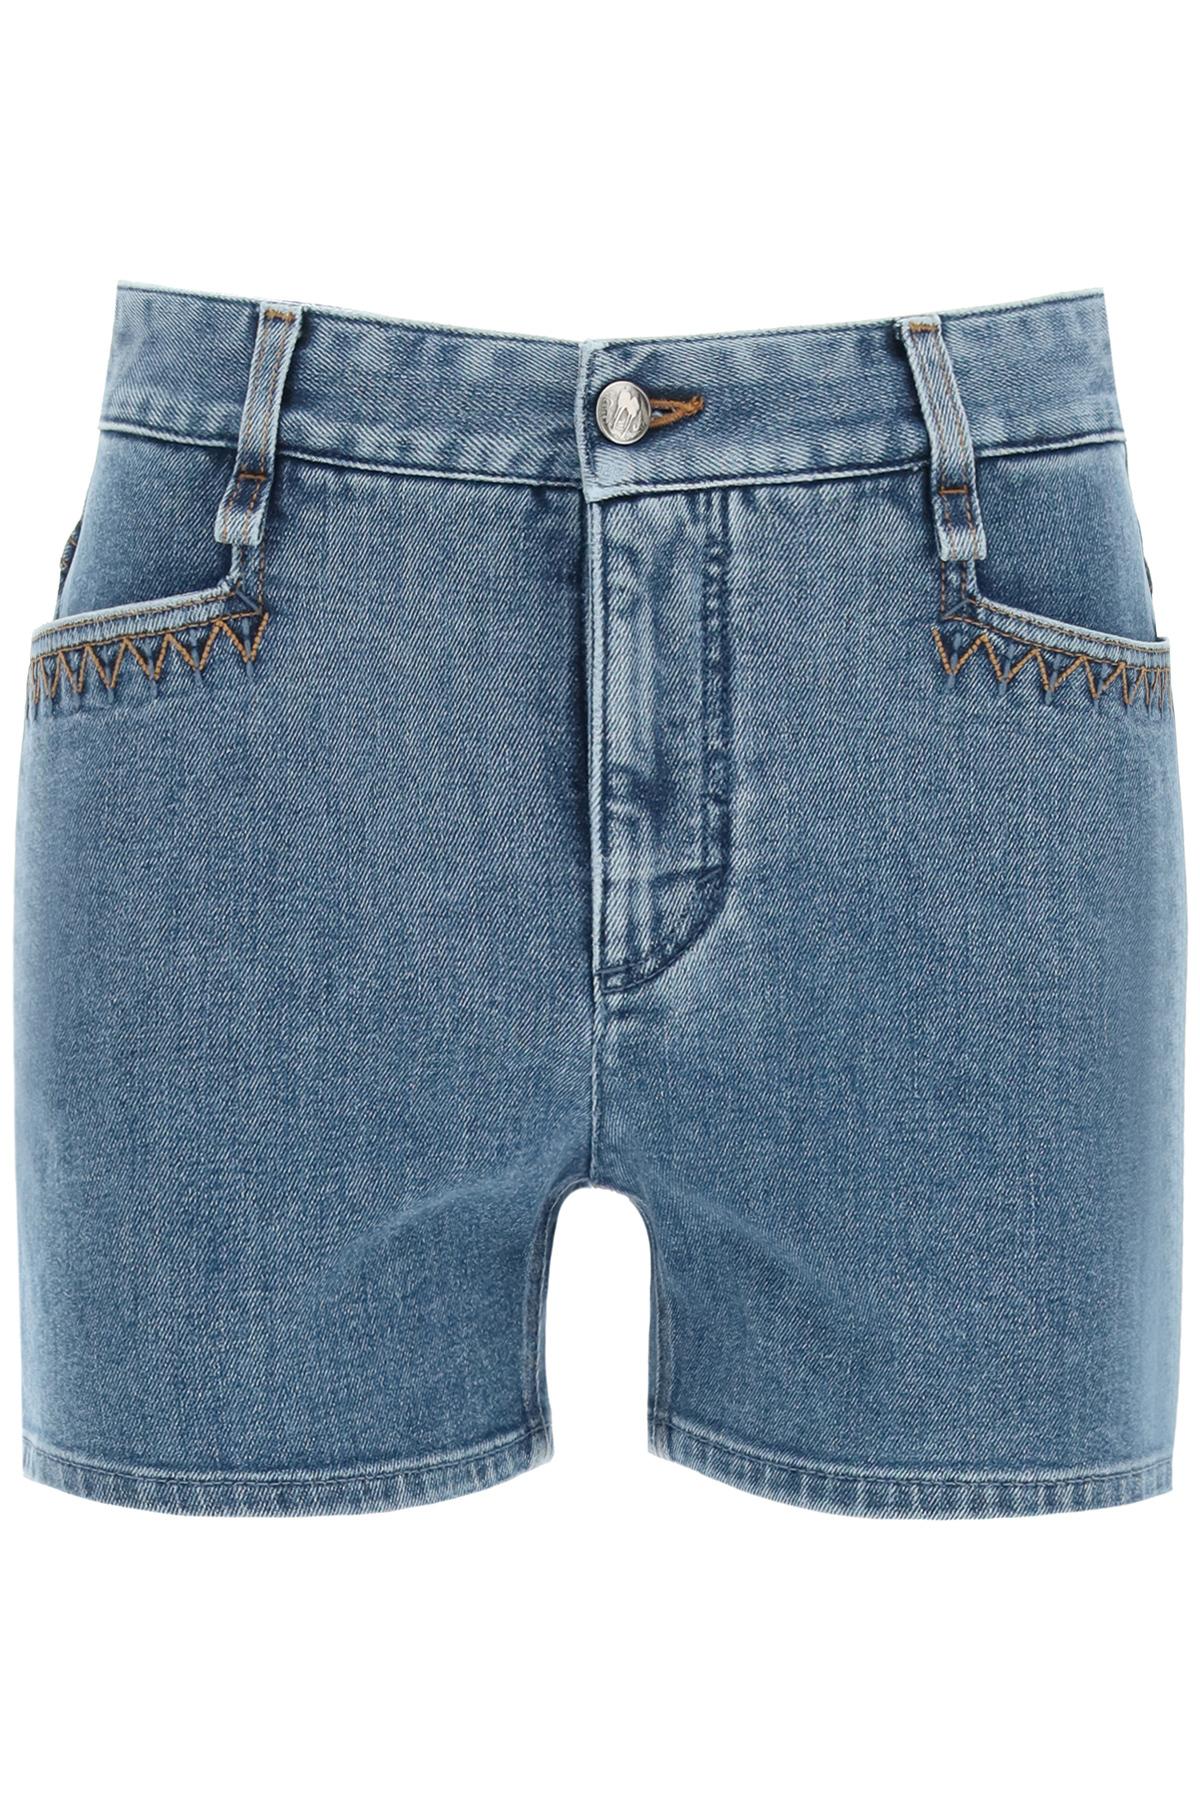 Chloe' shorts in denim logo a laser